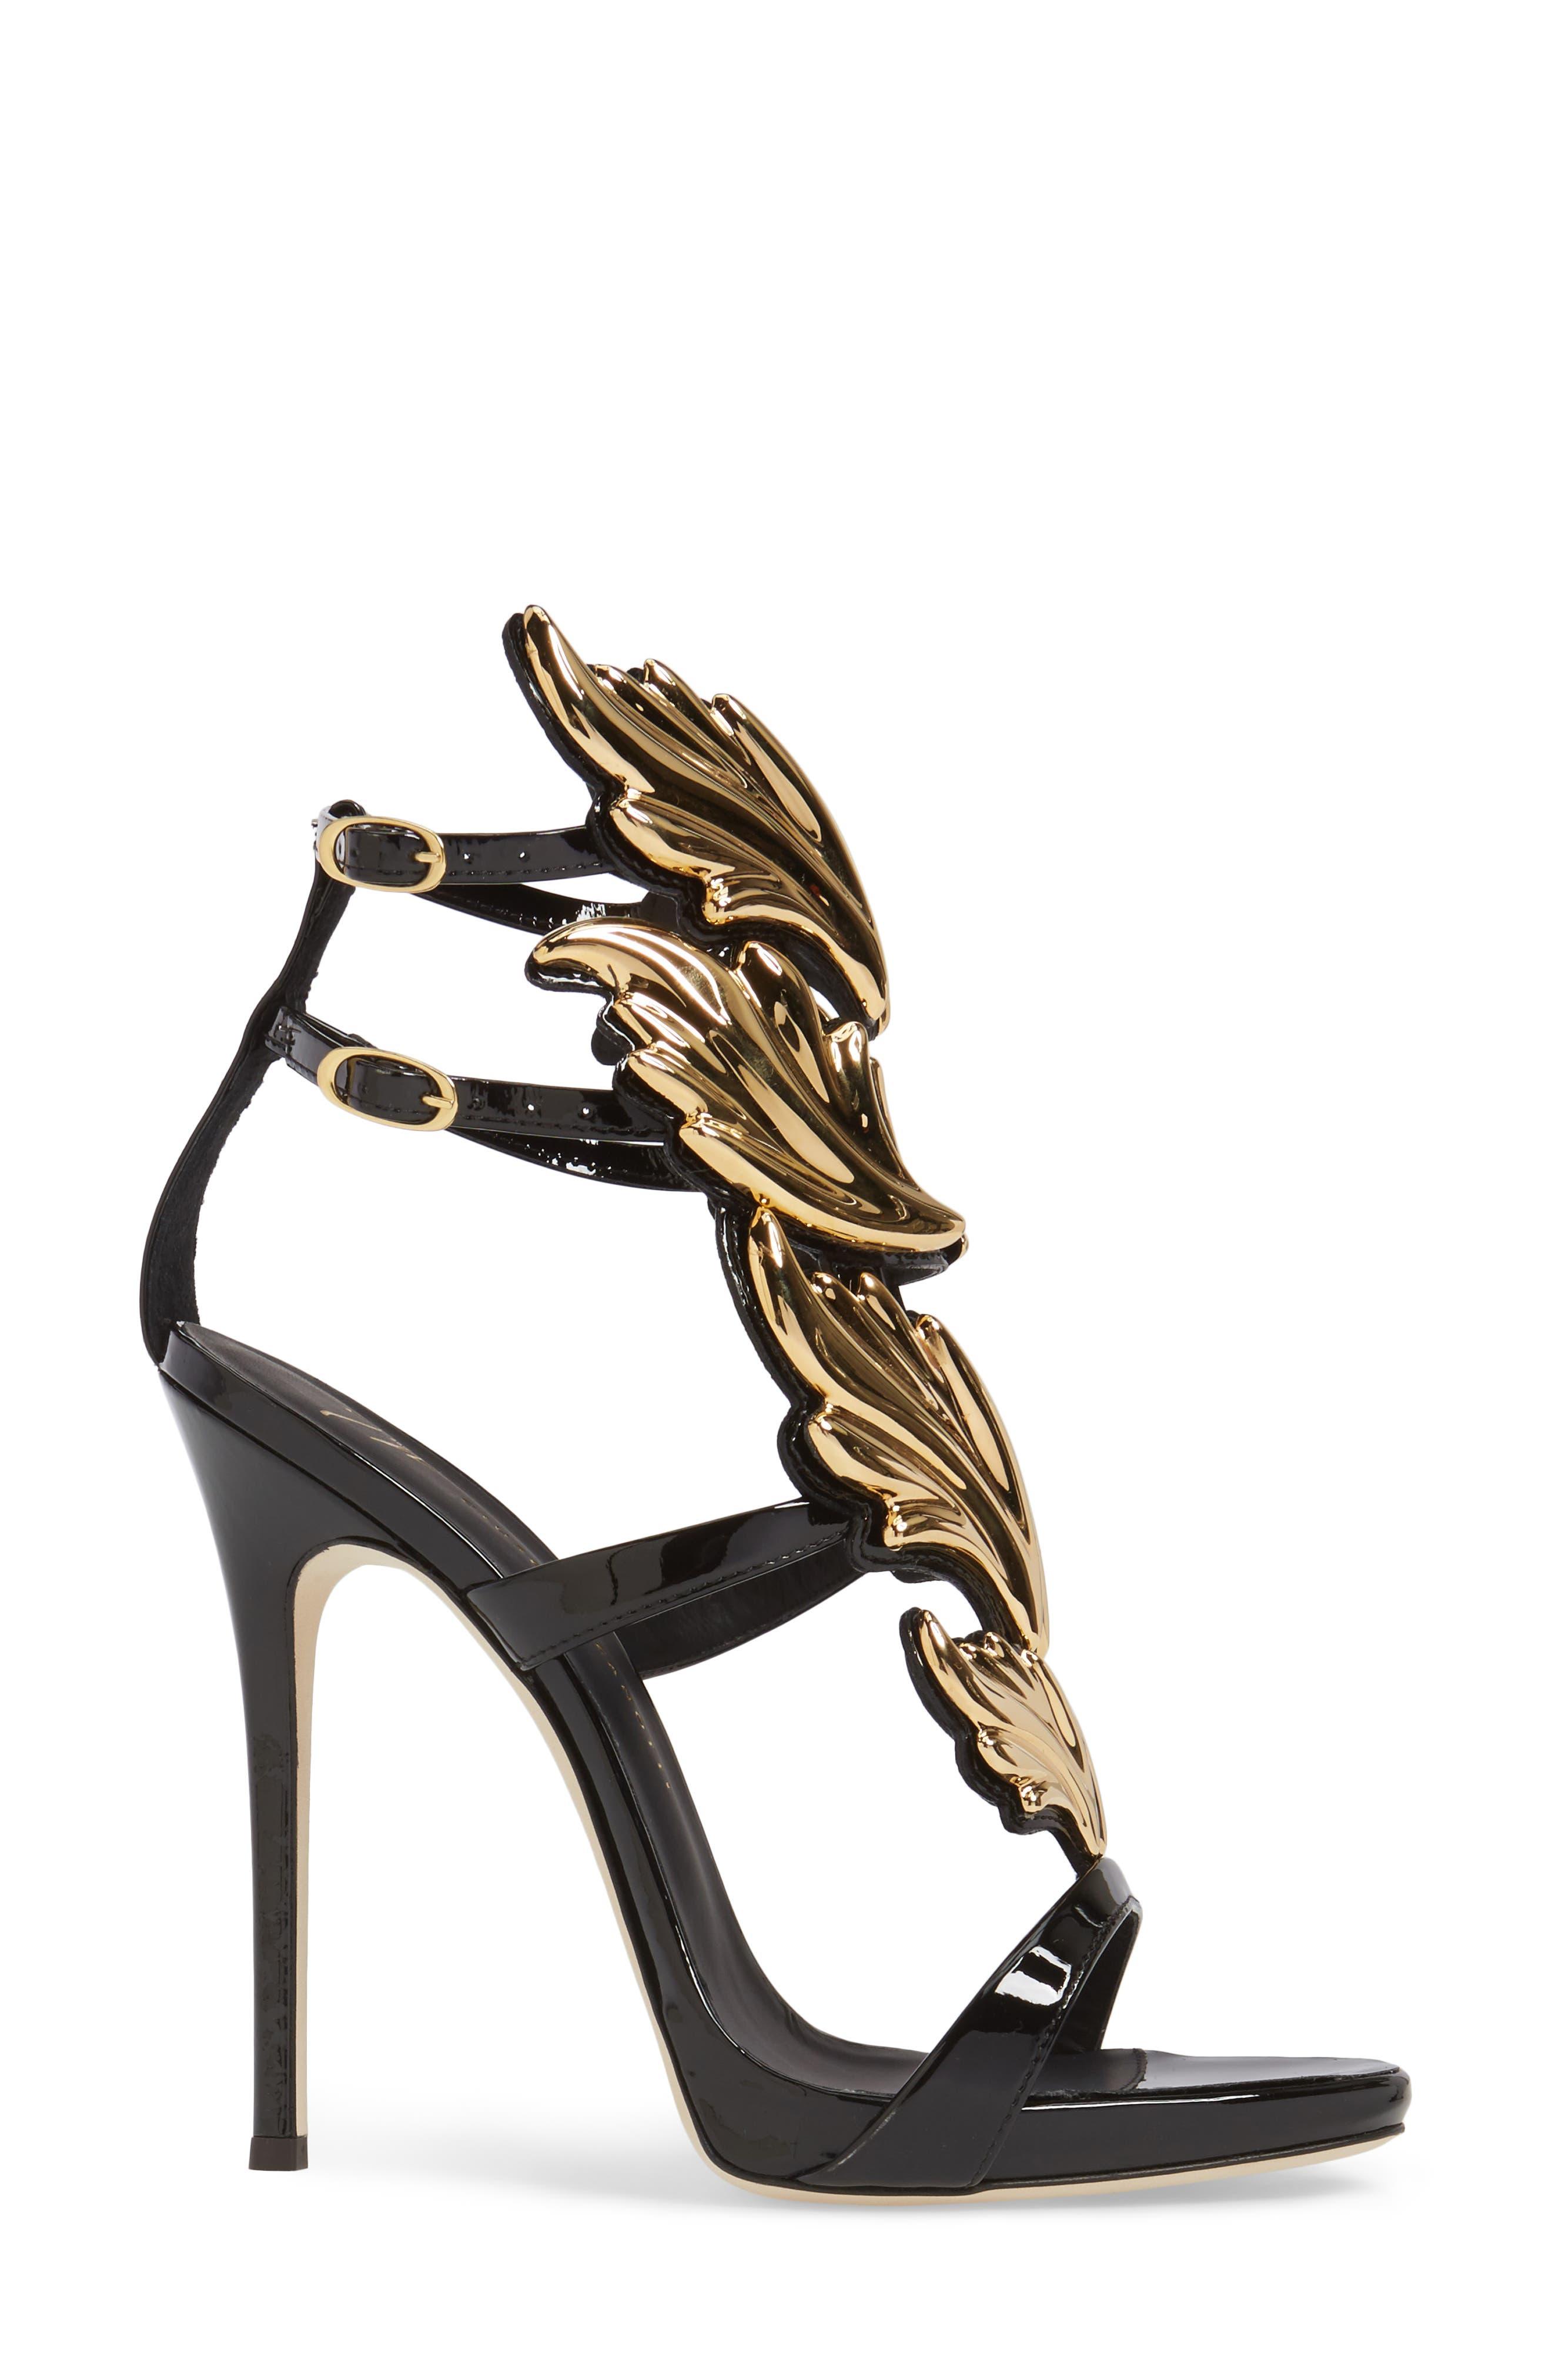 GIUSEPPE ZANOTTI, Cruel Wing Sandal, Alternate thumbnail 3, color, BLACK/ GOLD